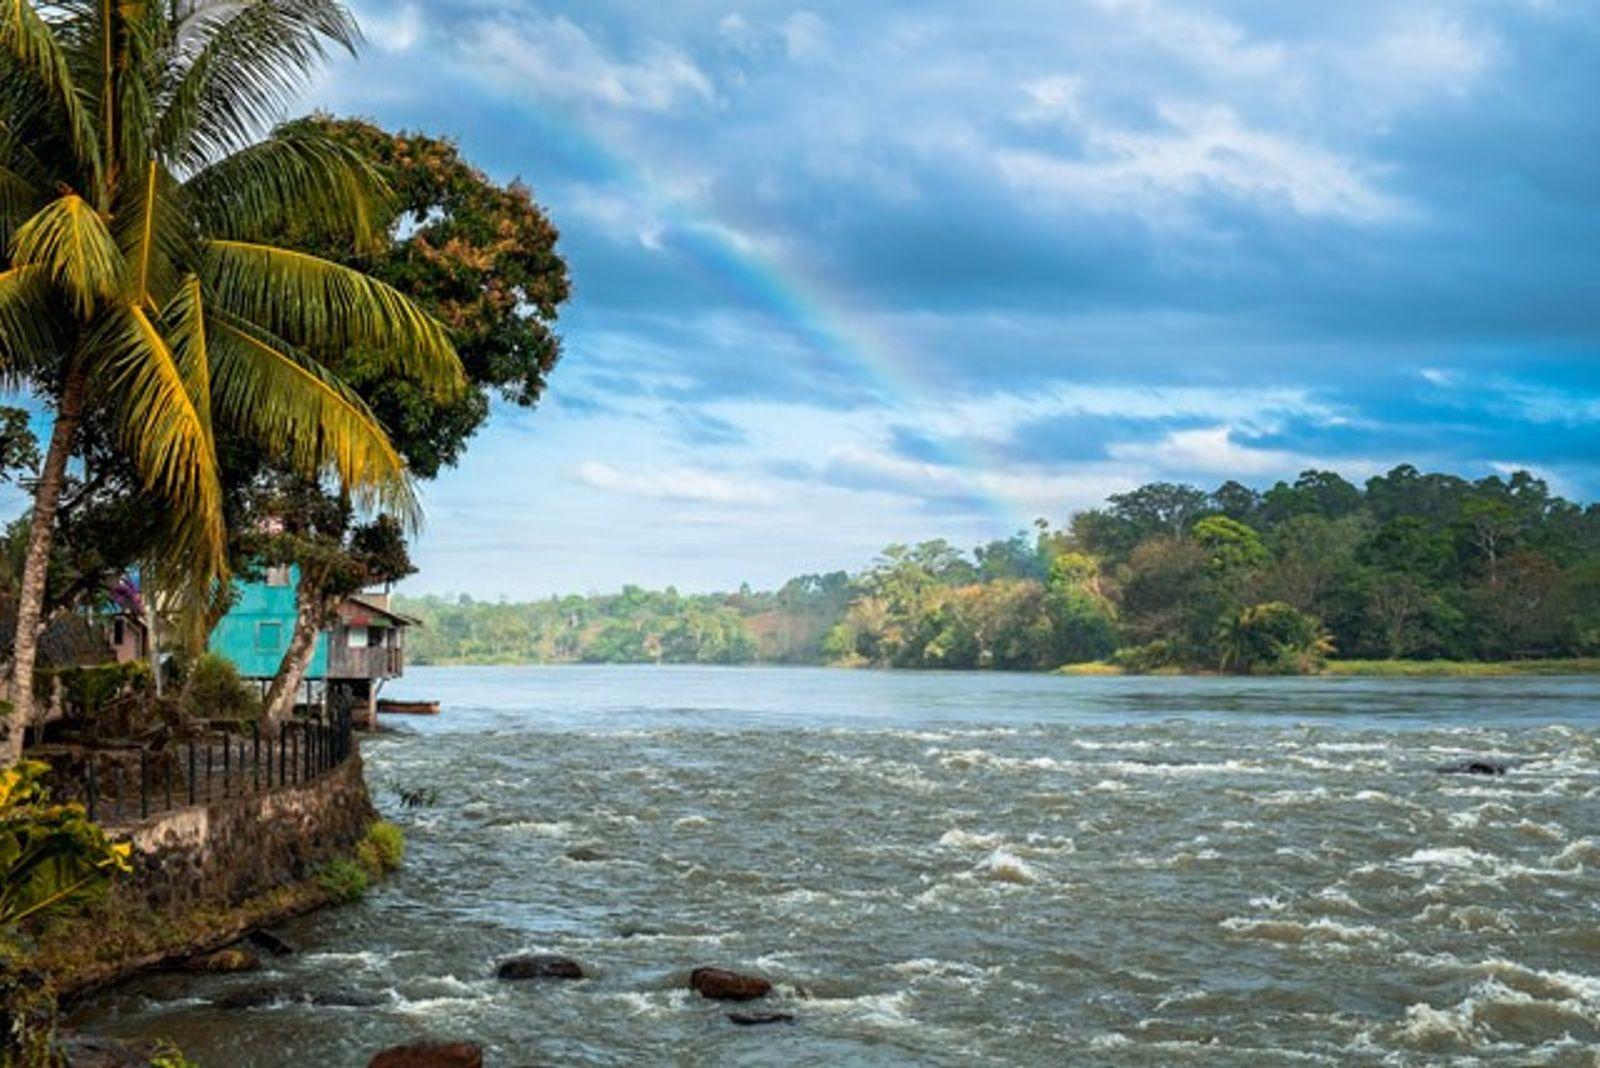 Nicaragua: Coast to coast